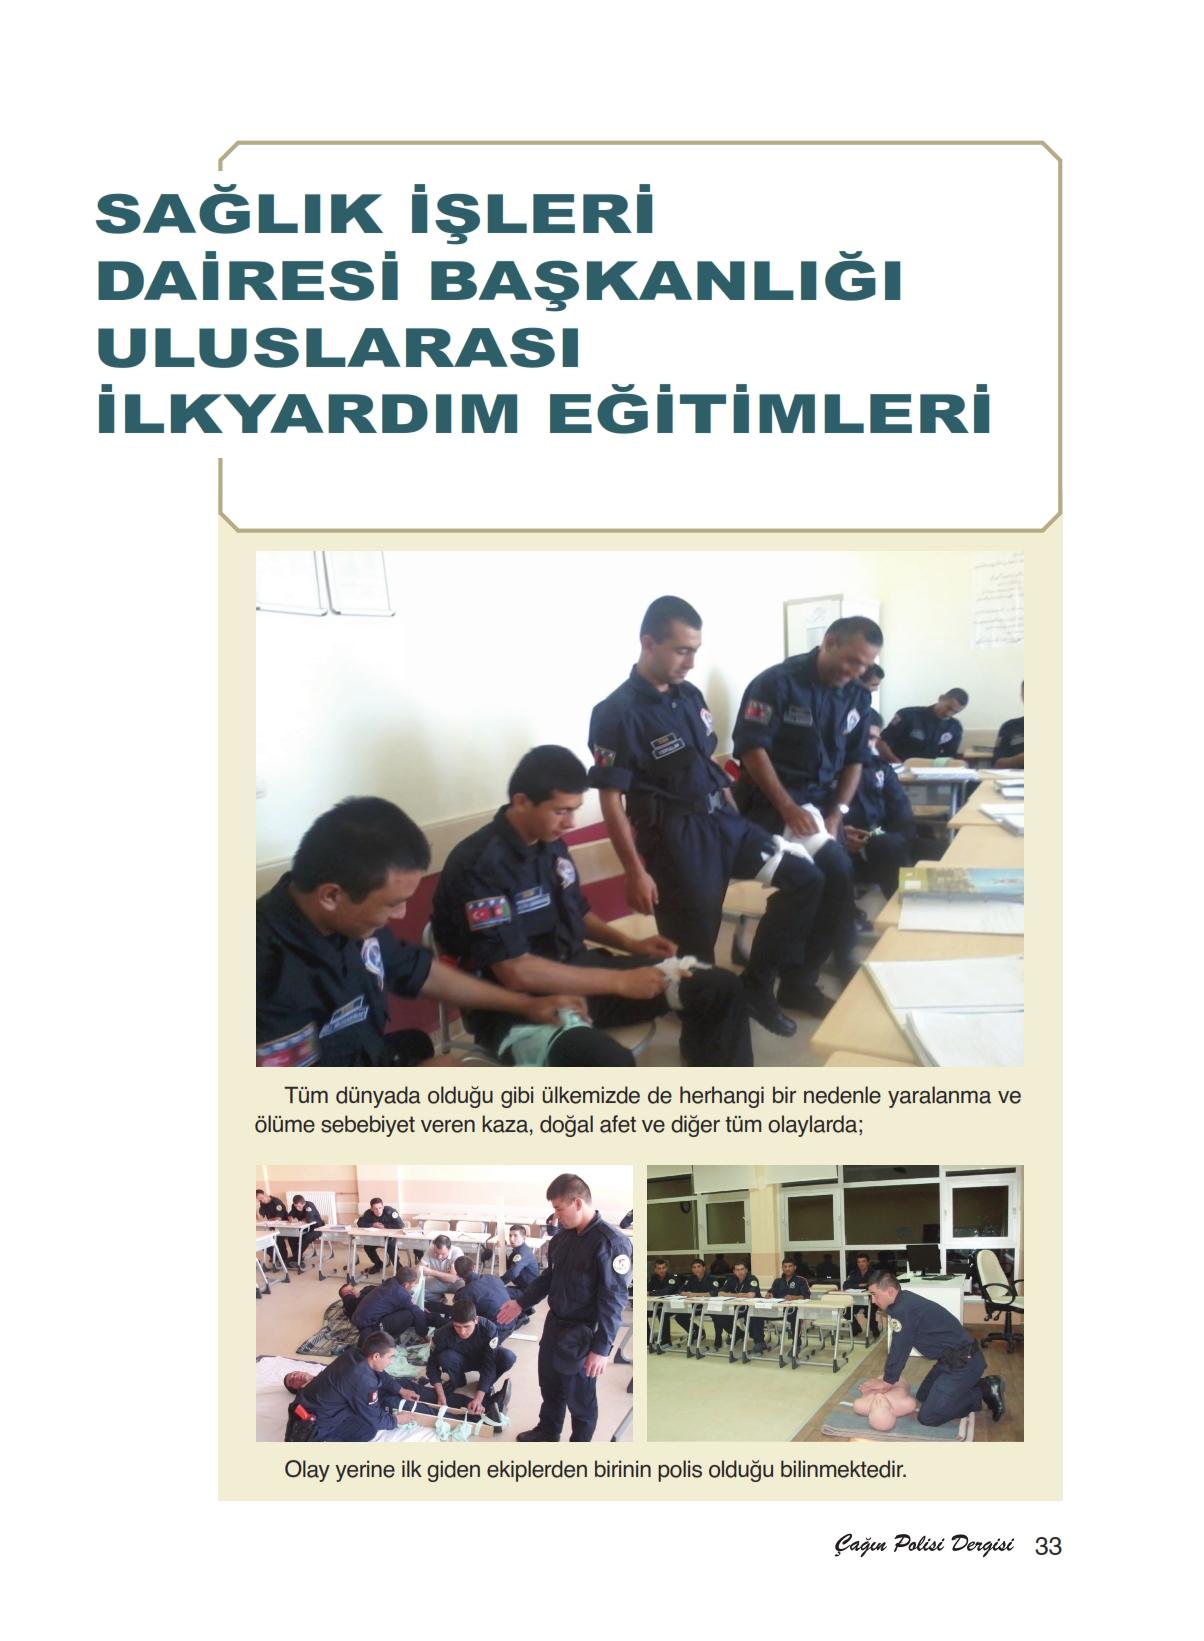 polis_dergi_ekim_2013_baski_035